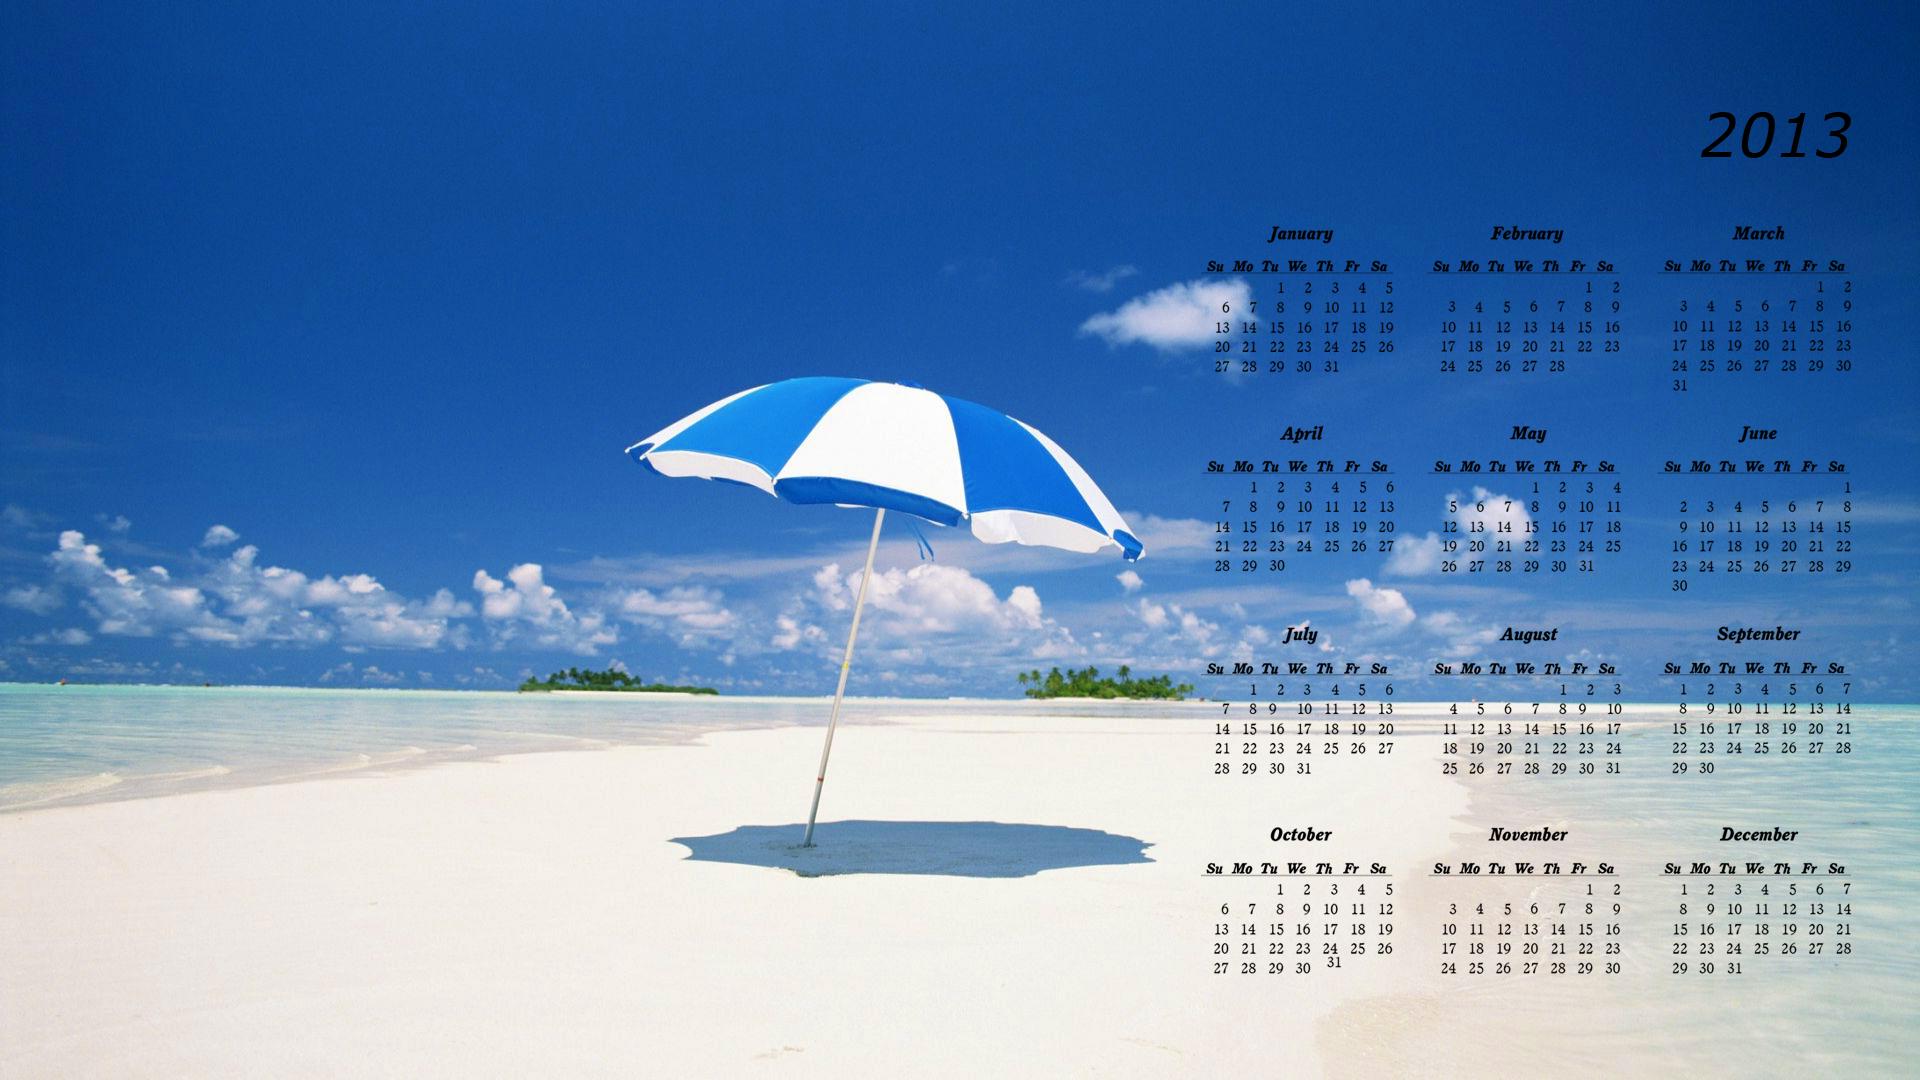 Calendar Wallpaper Hd For Pc : Desktop wallpaper calendar wallpapersafari